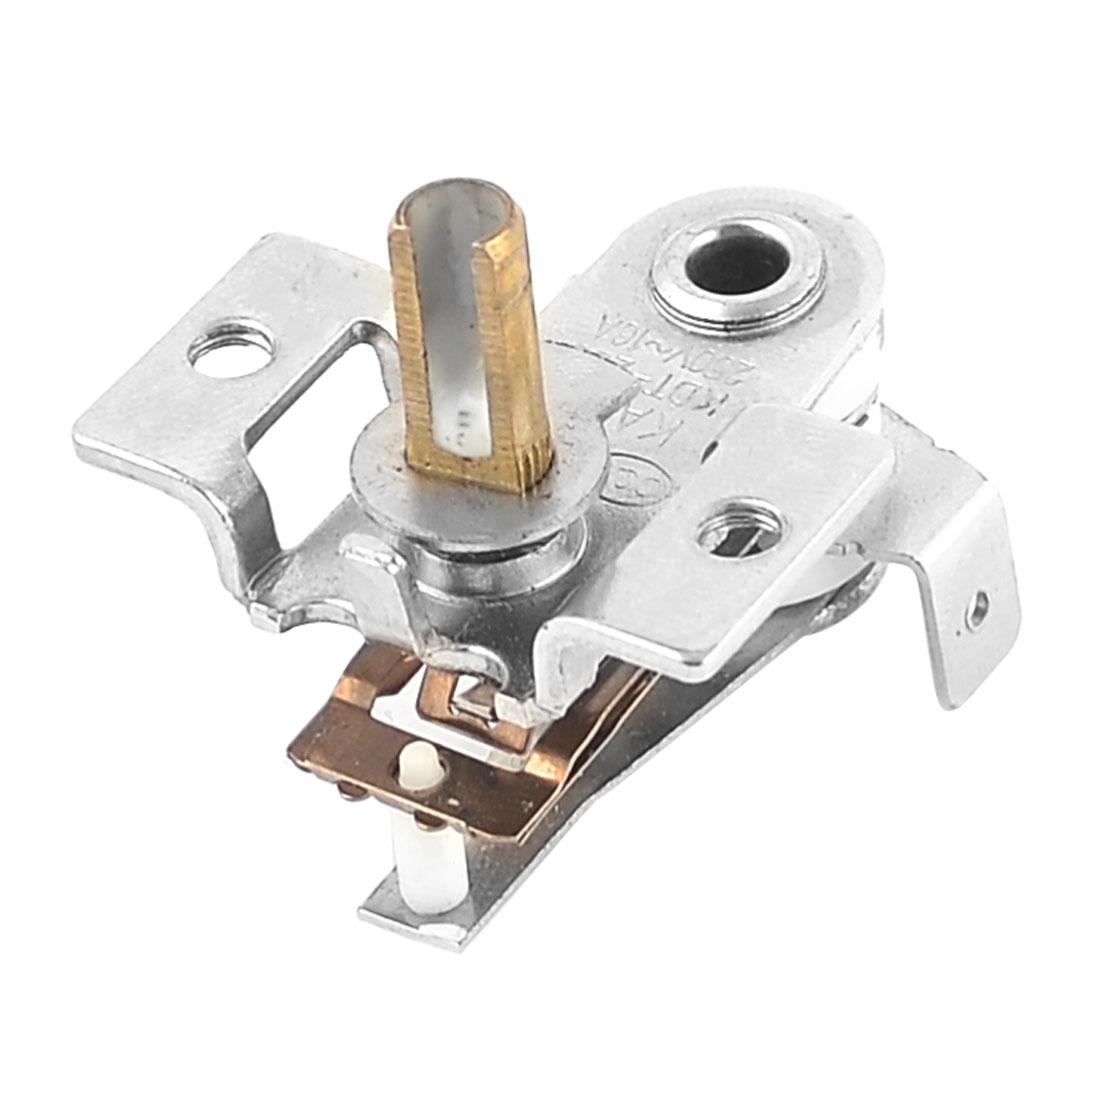 AC250V 16A Bimetallic Discs Adjustable Heating Limiter Hot Thermostat